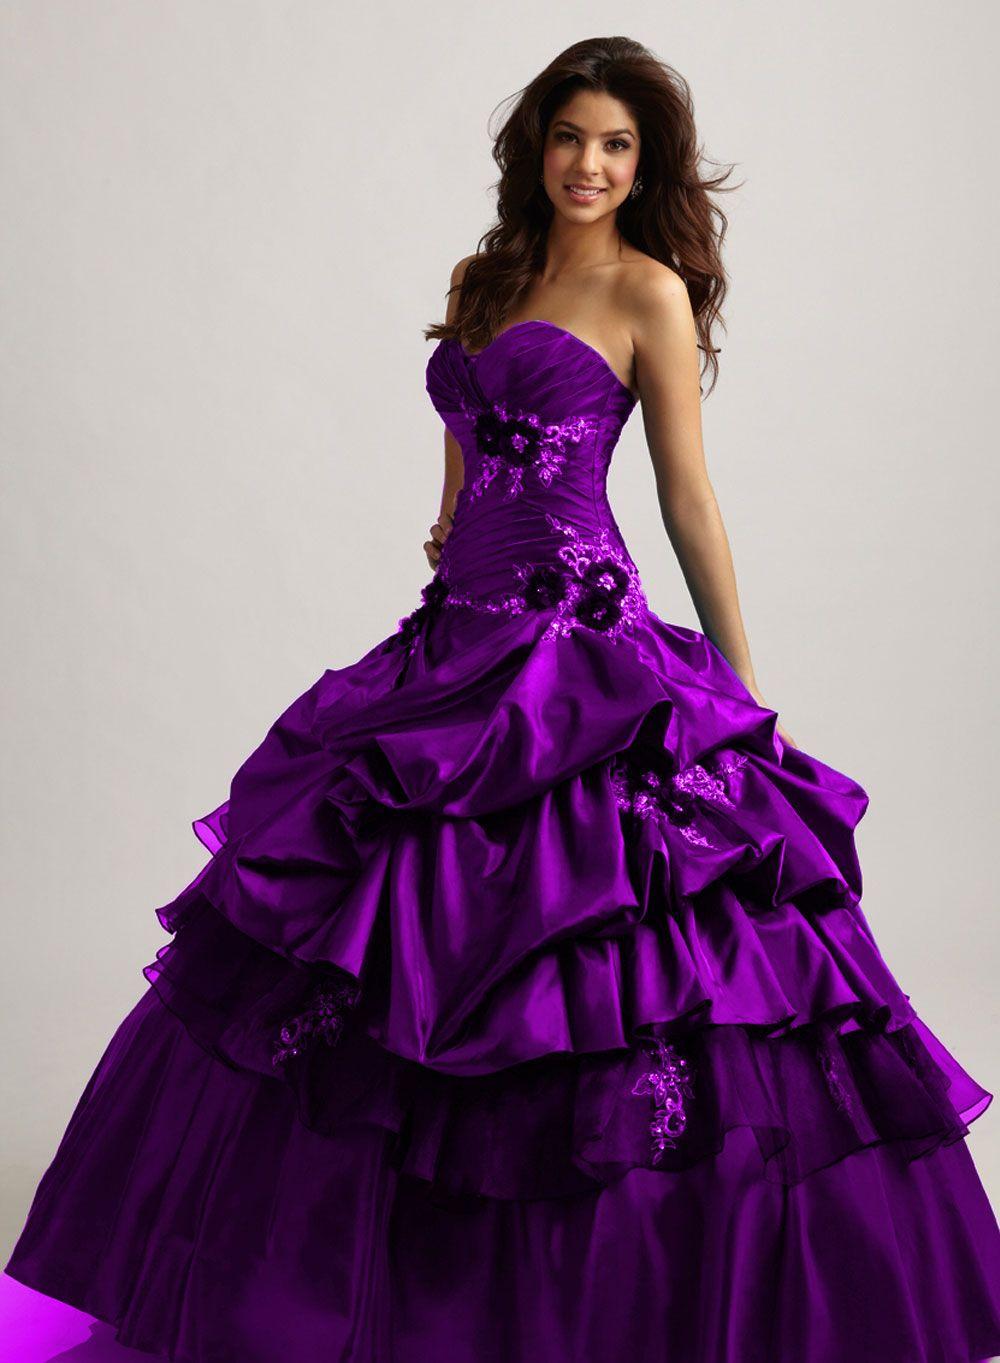 Teal Dresses for quinceneras | Enviar por correo electrónico Escribe ...